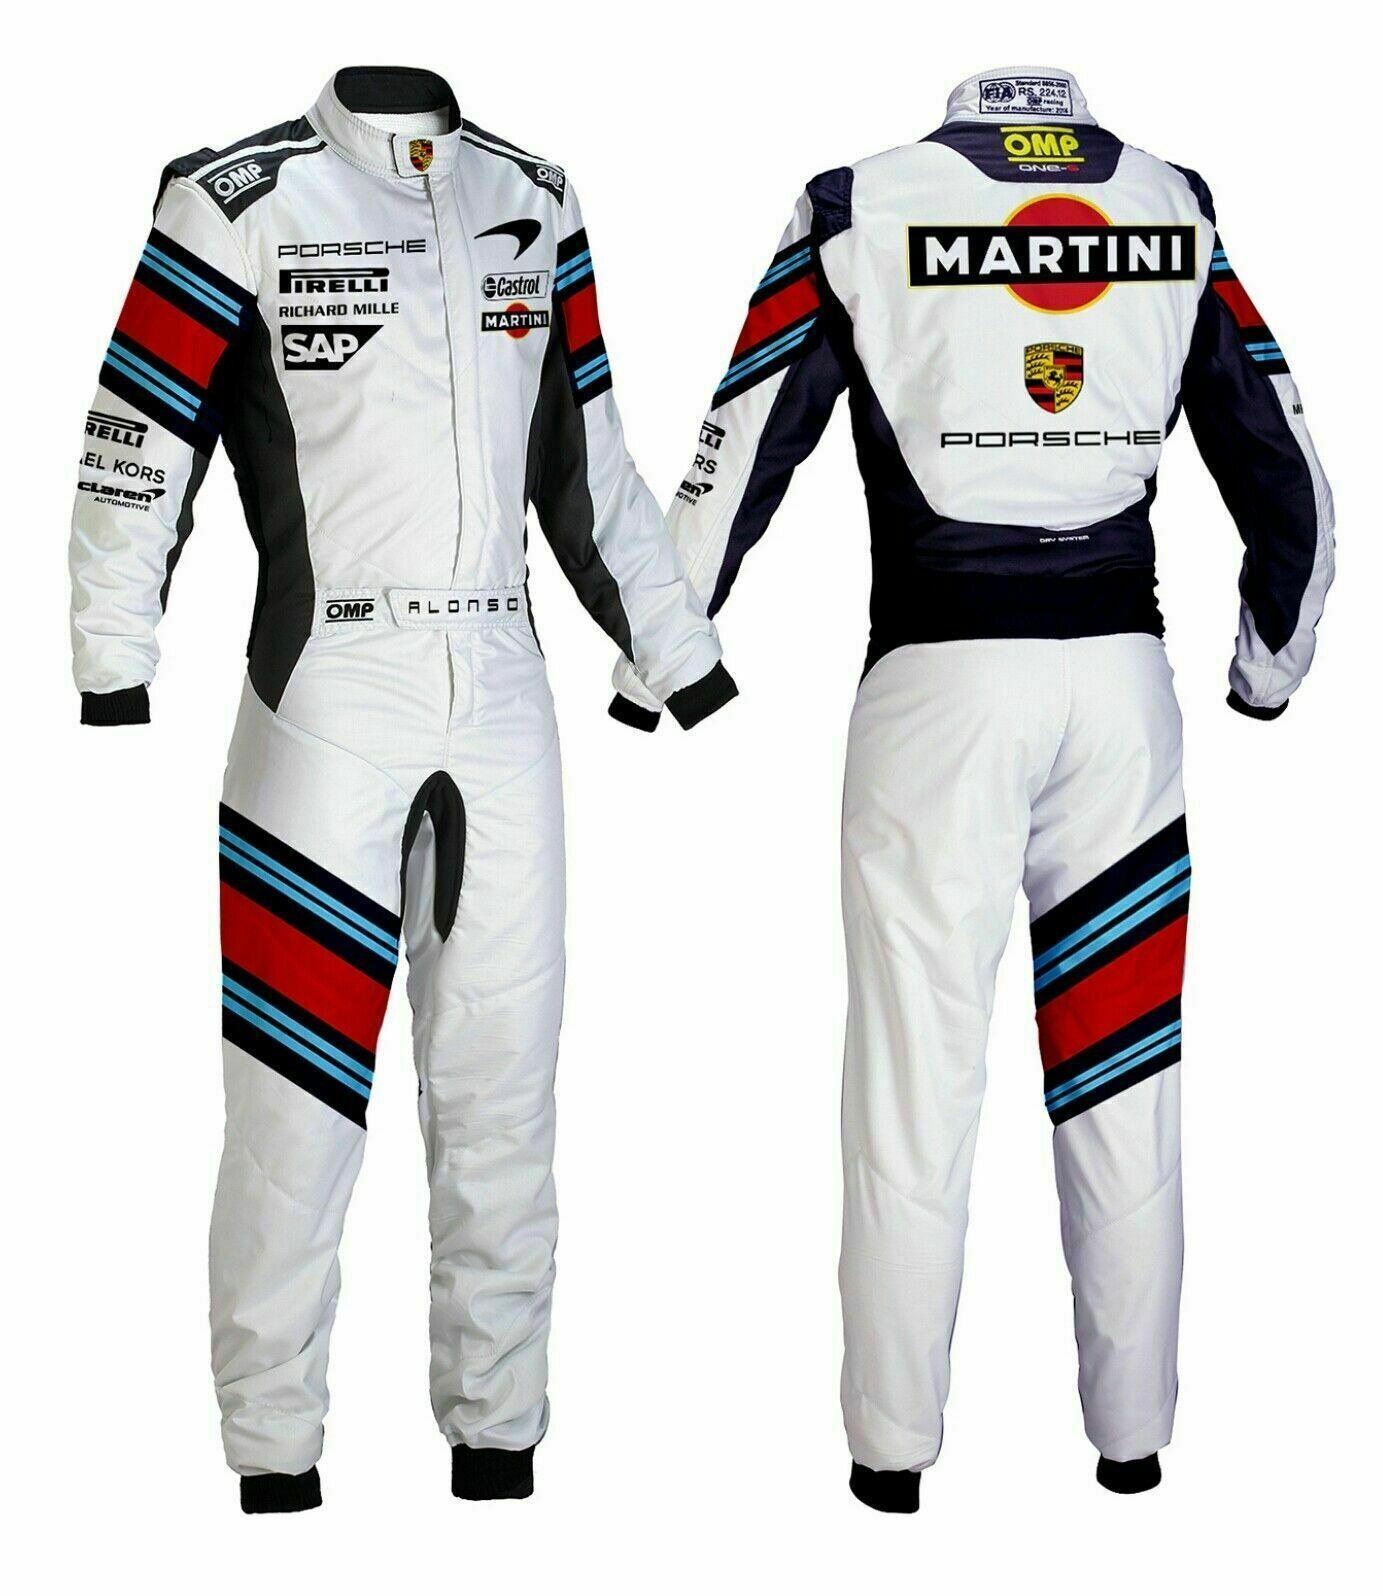 Karting suit Martini Go kart racing suit Level  2 version Kart racing suit  affordable